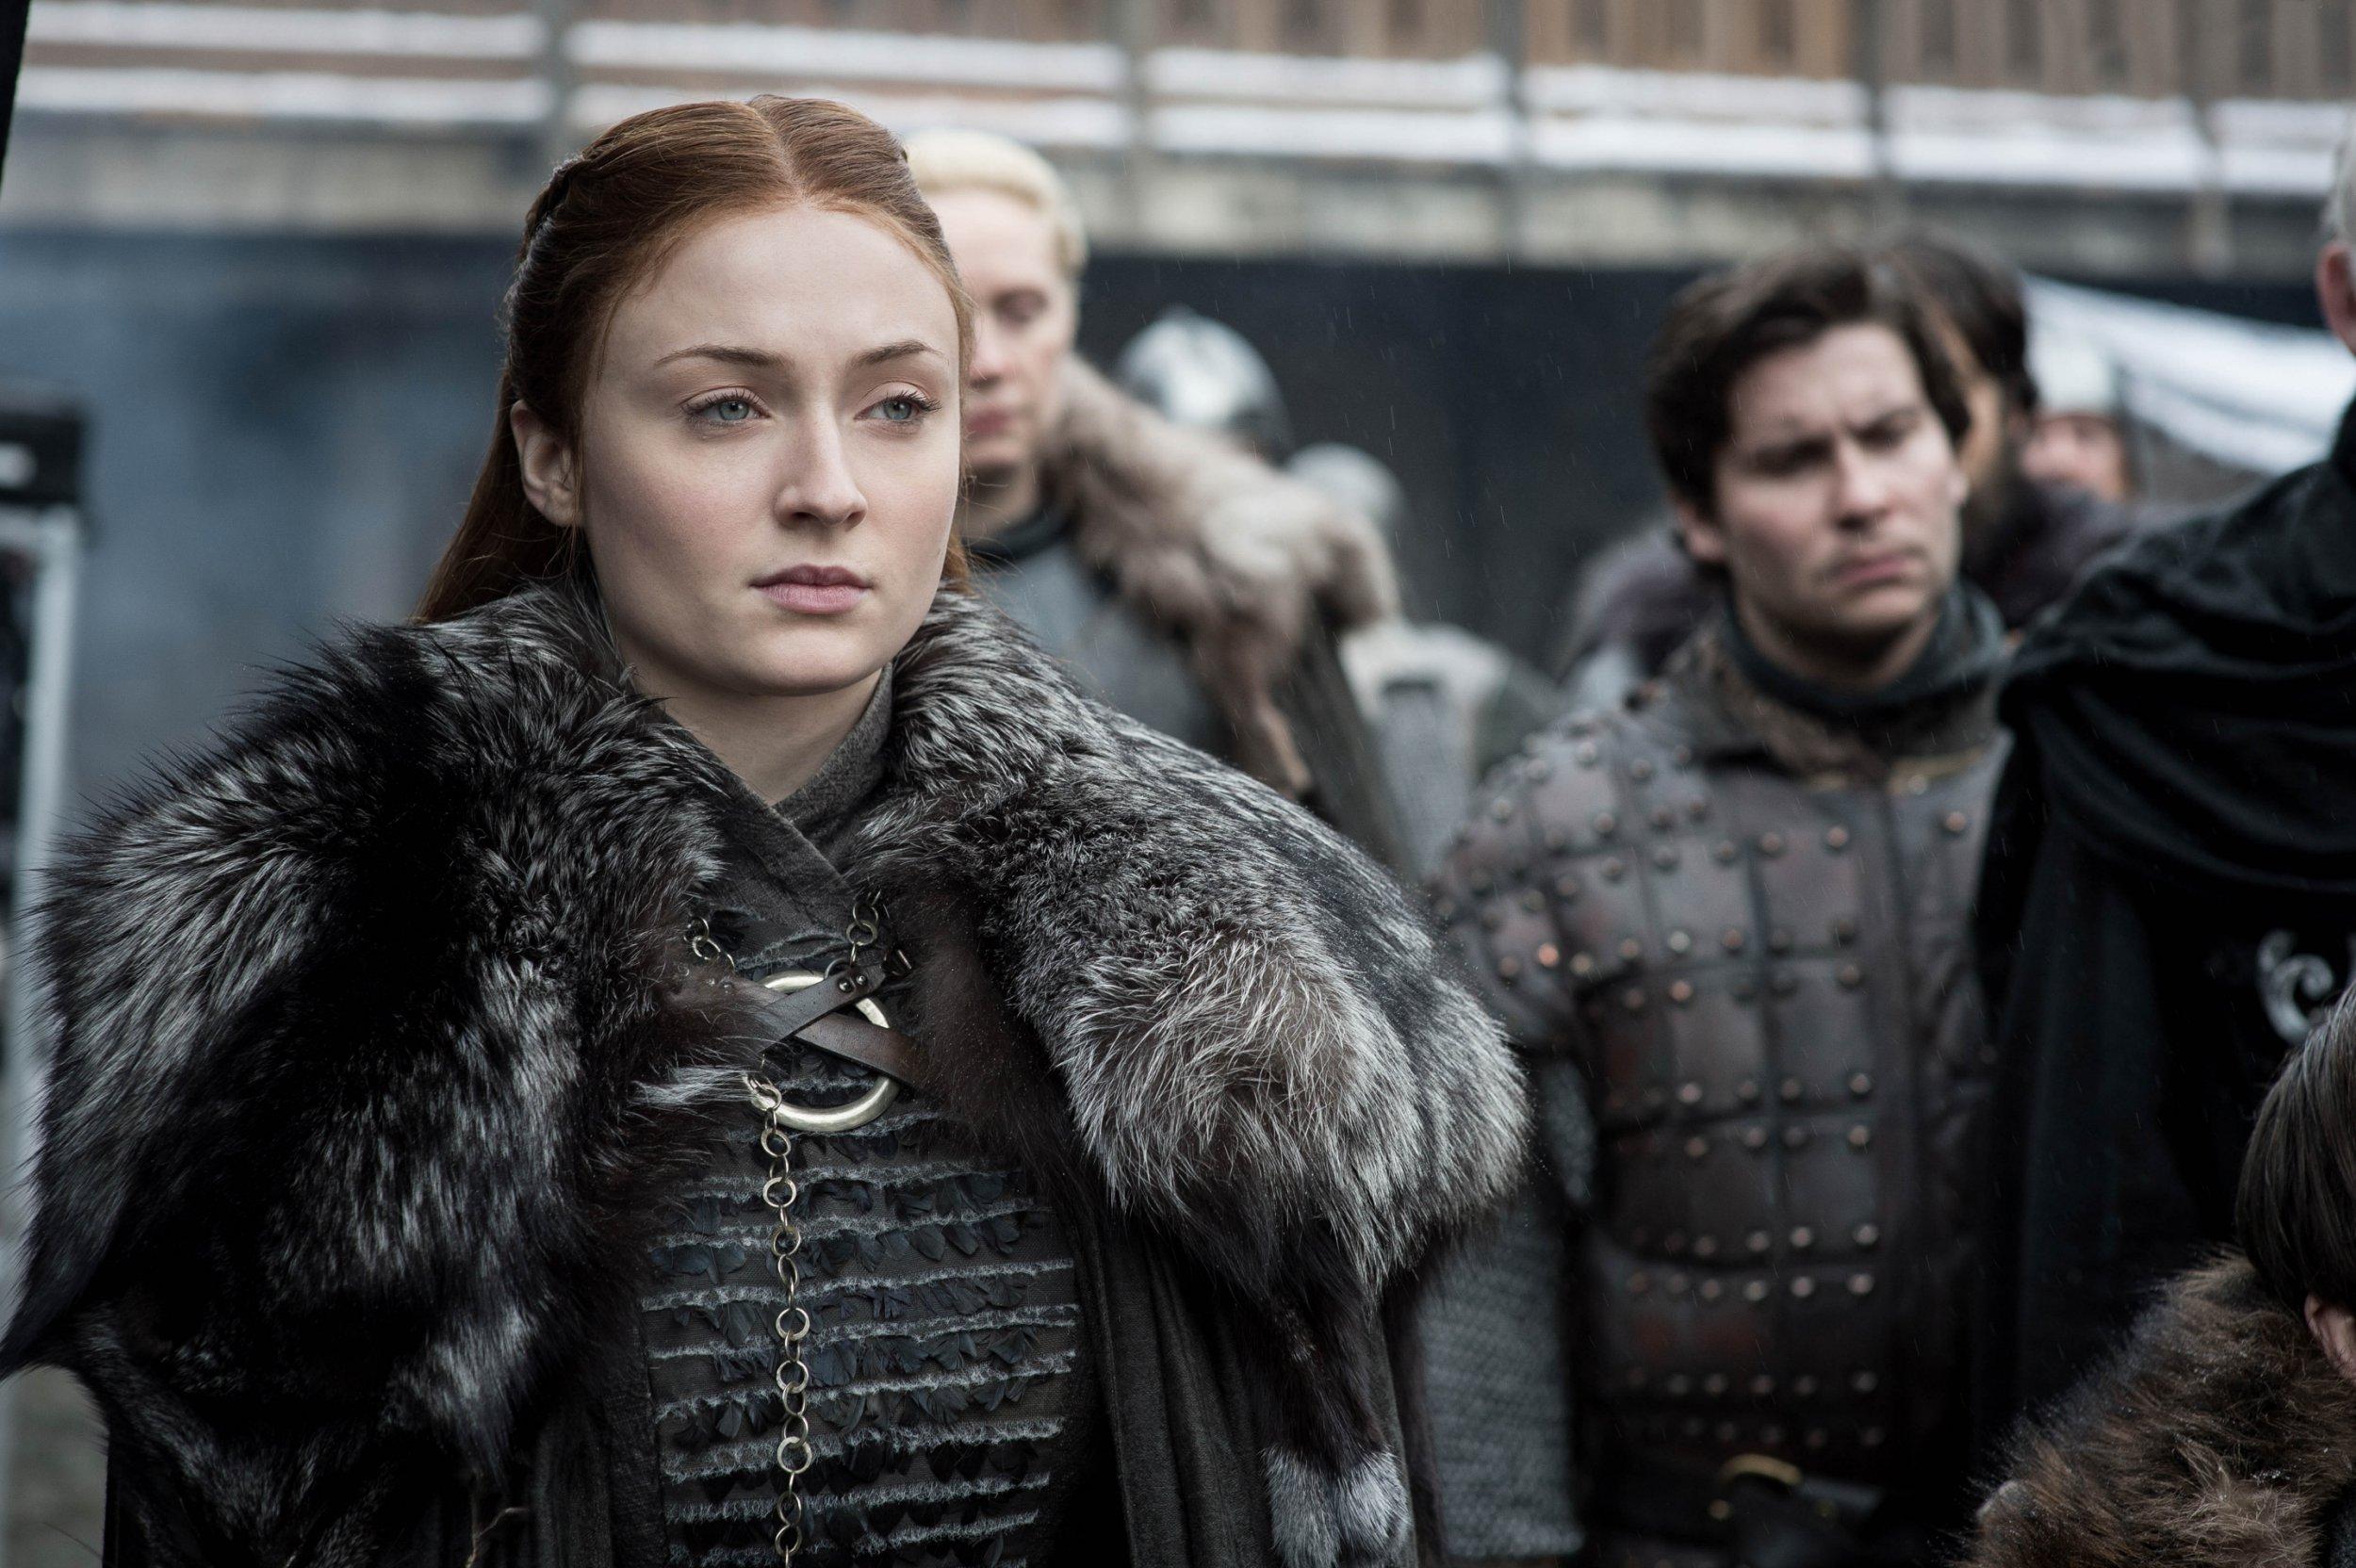 Game Of Thrones' Sophie Turner defends Sansa Stark's controversial 'rape' line in final season